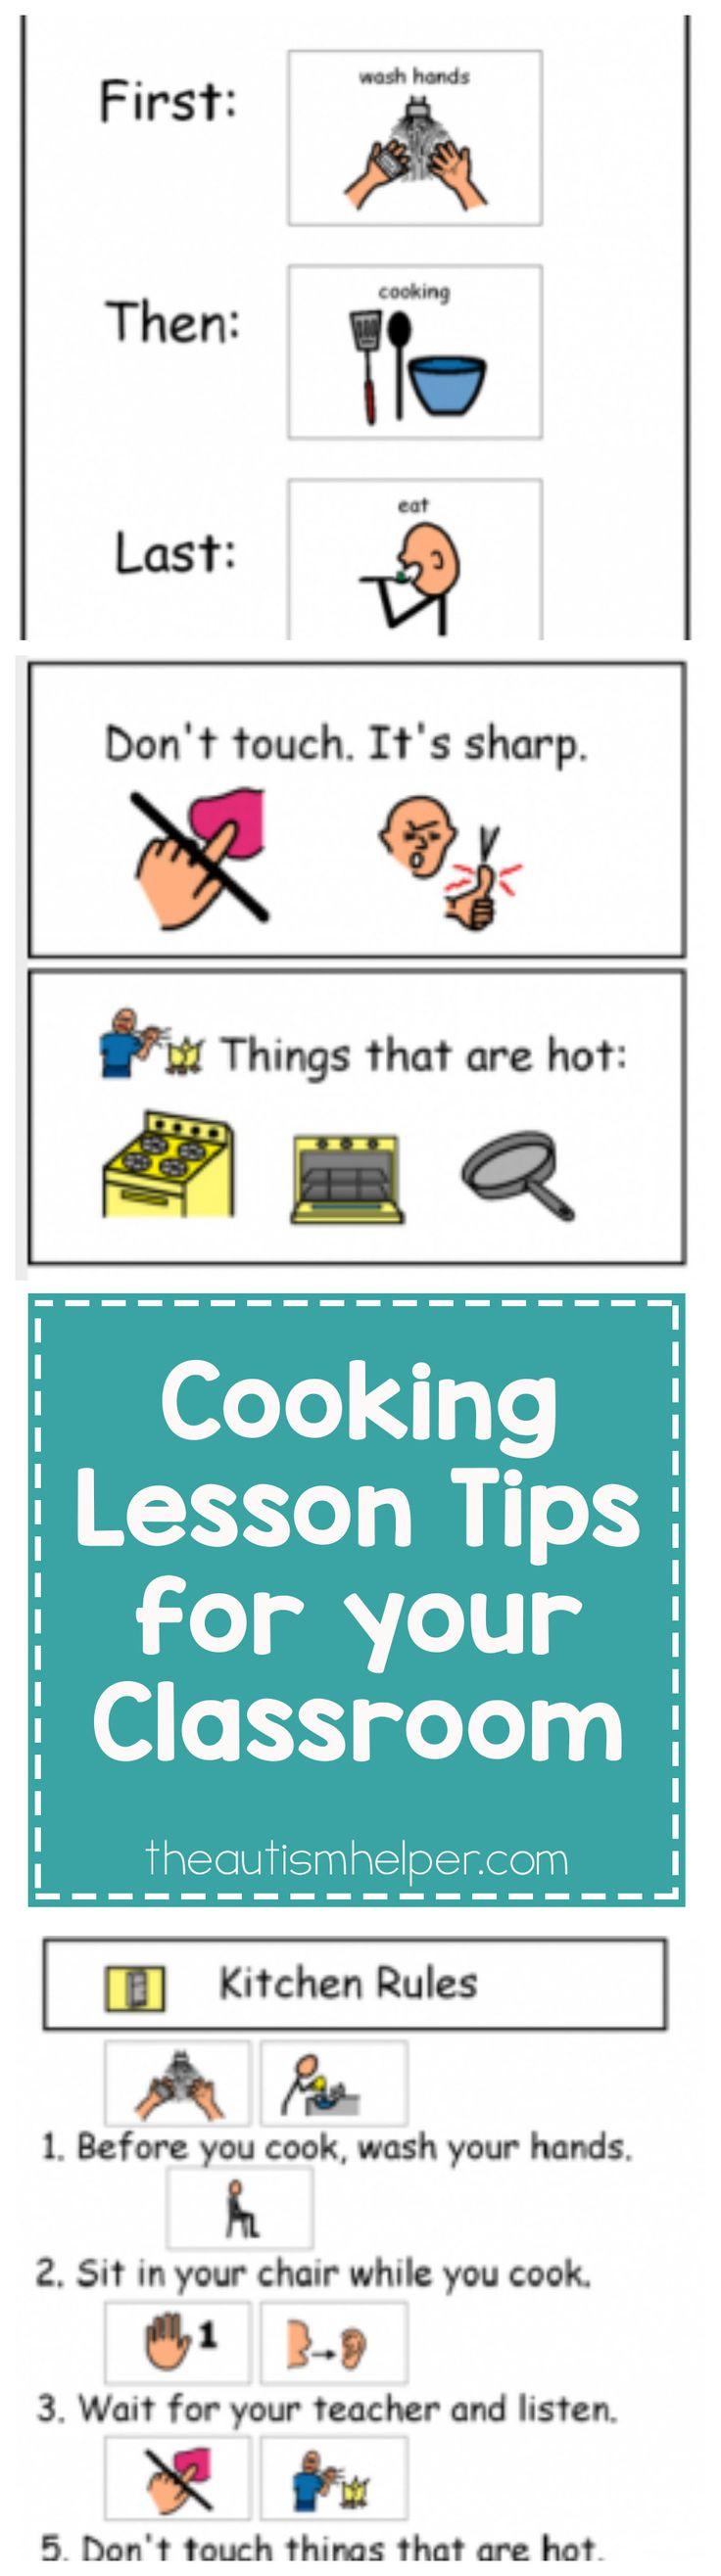 65 best Life Skills Kitchen images on Pinterest   Life skills ...